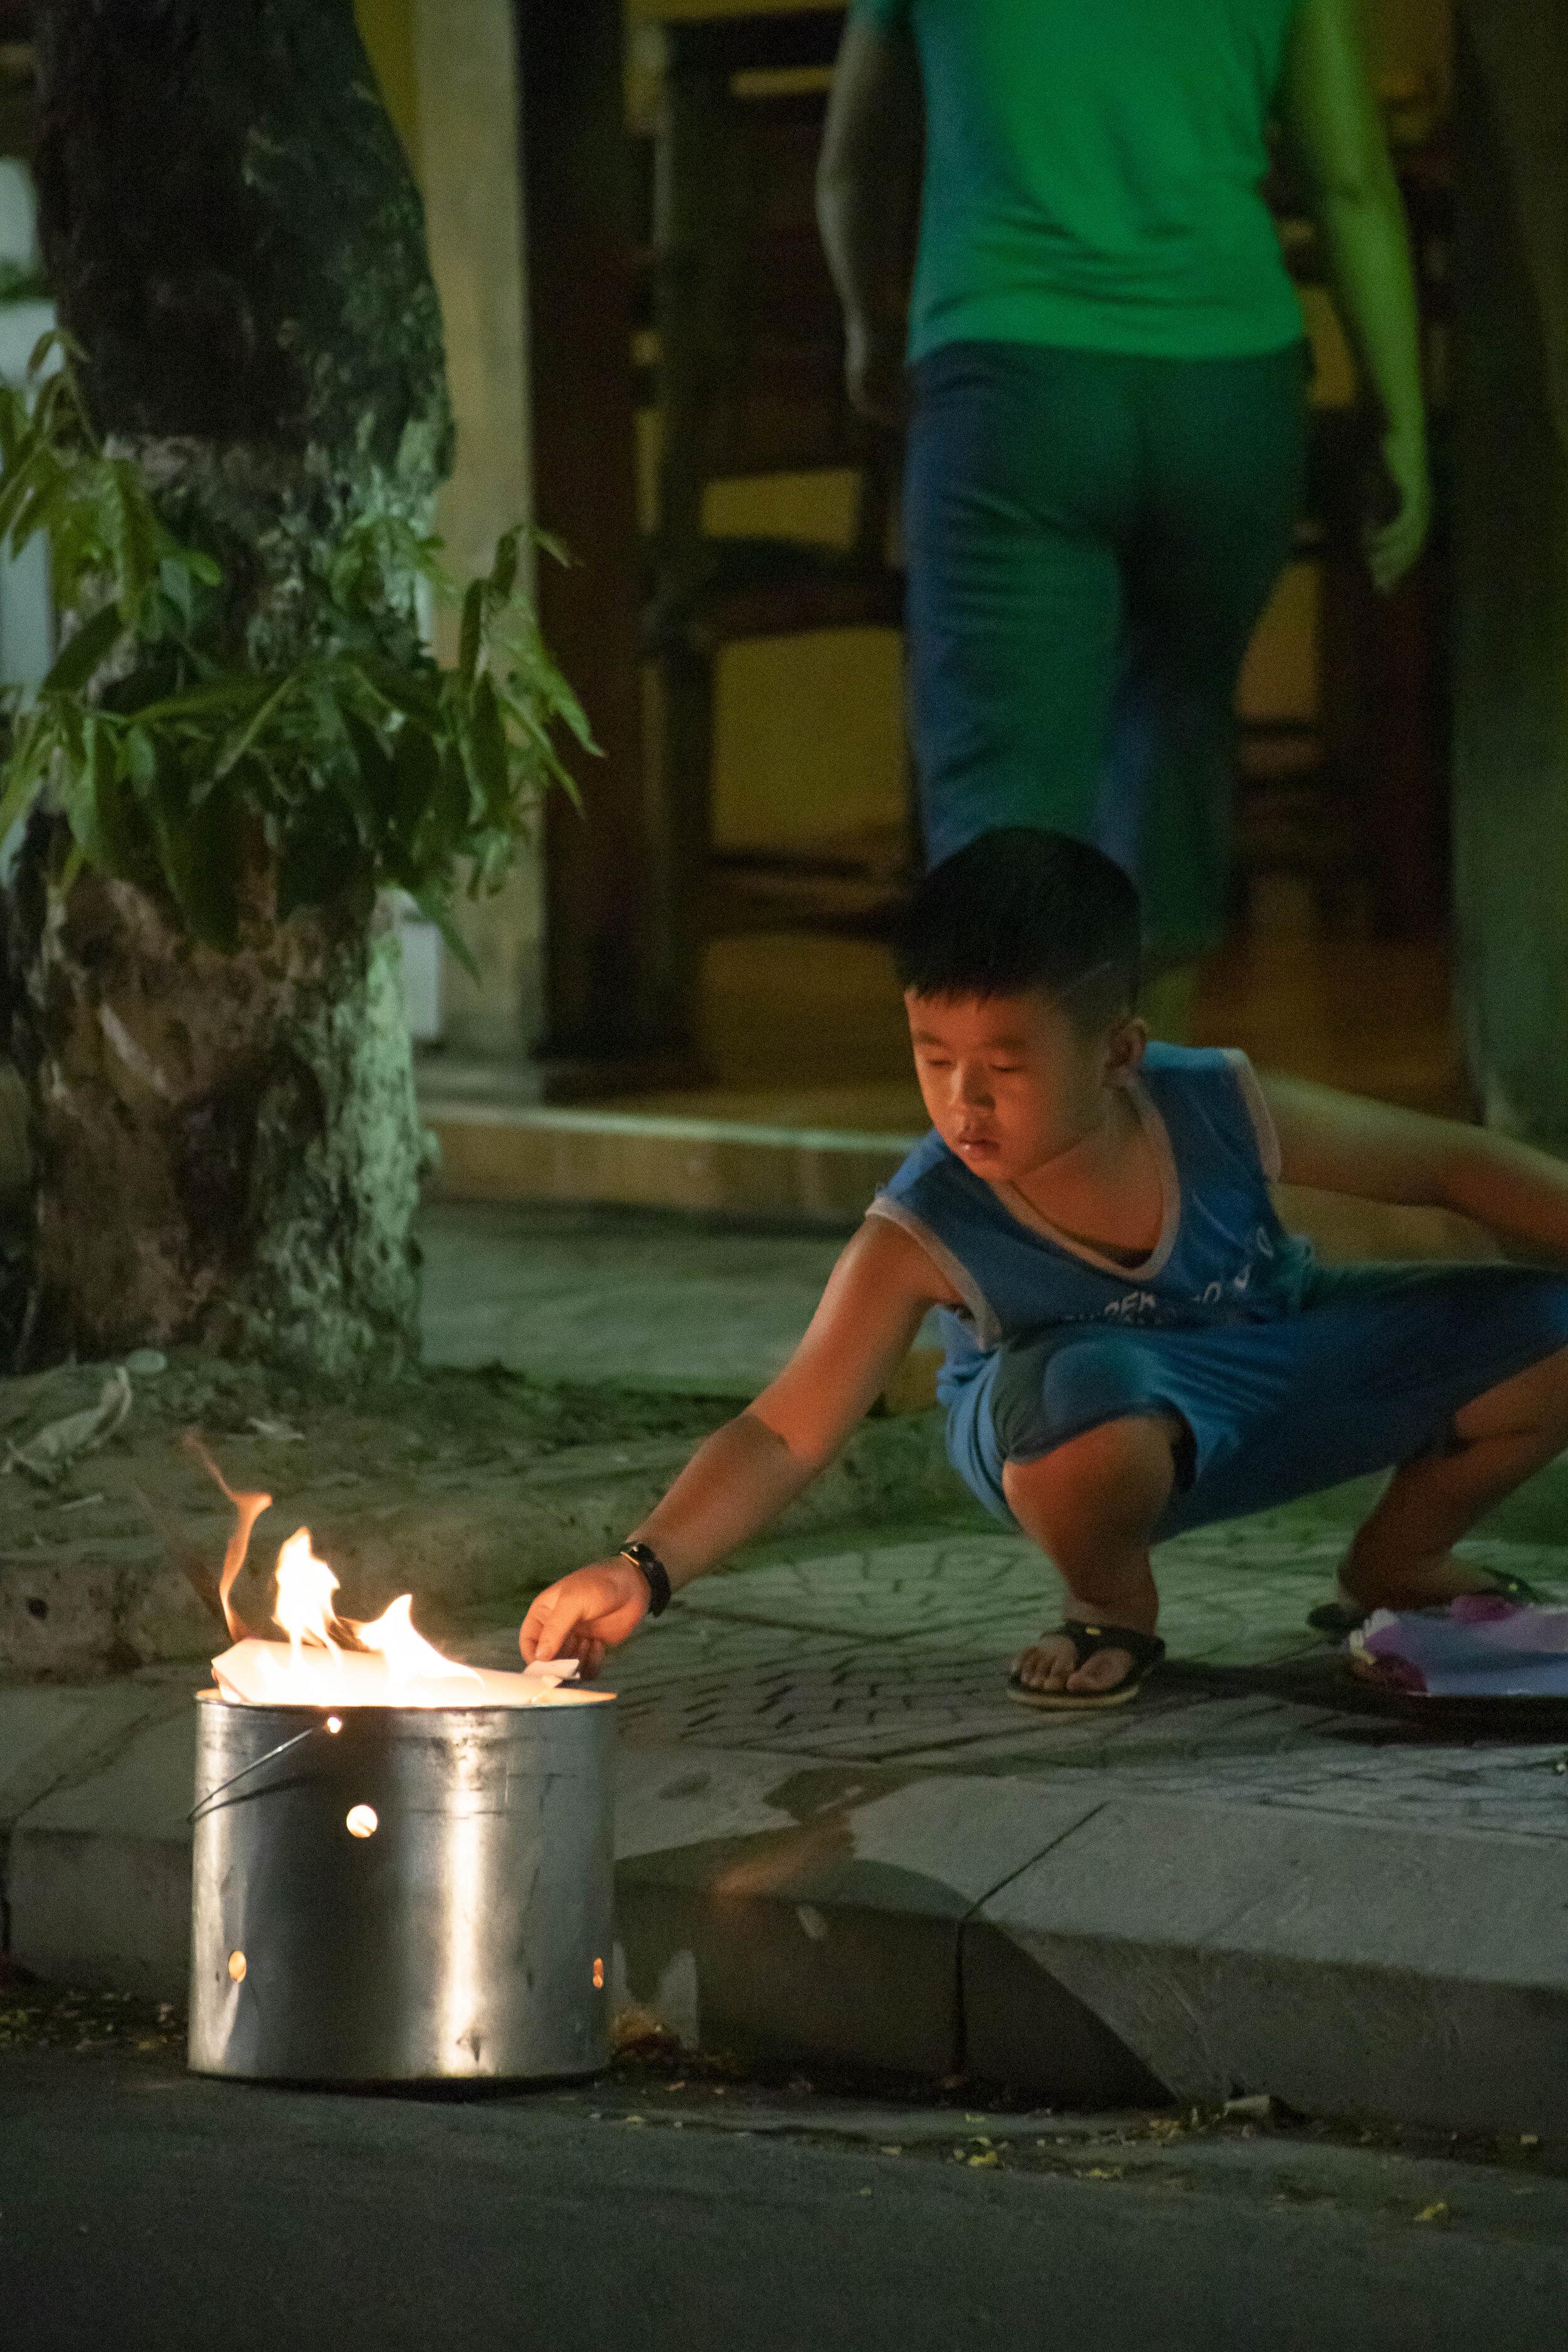 kid burning paper.jpg